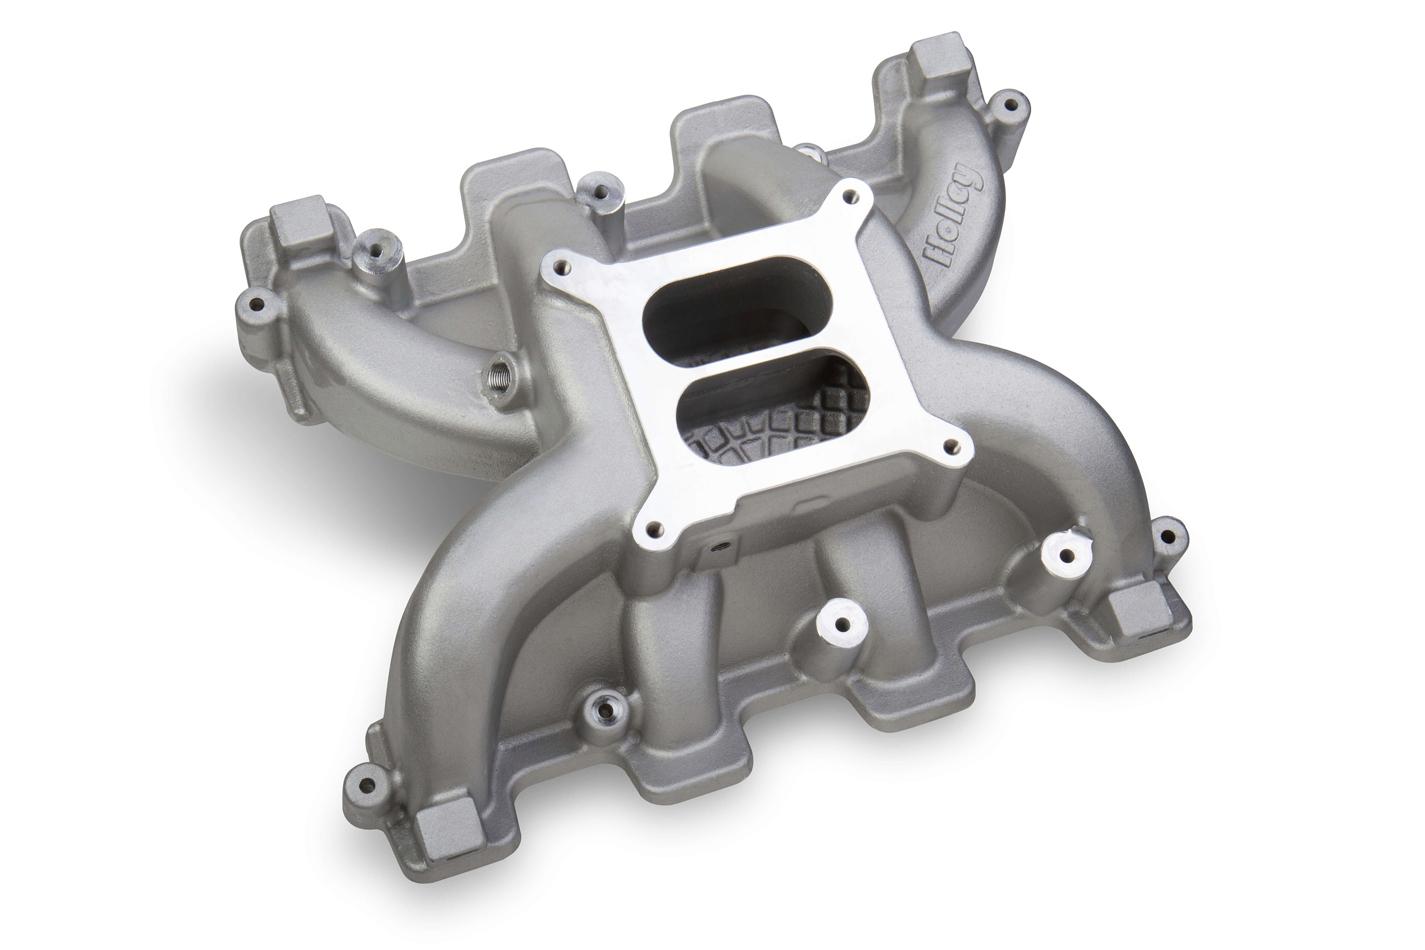 Holley 300-130 Intake Manifold, Dual Square Bore, Dual Plane, Aluminum, Natural, LS1 / LS2 / LS6, GM LS-Series, Each